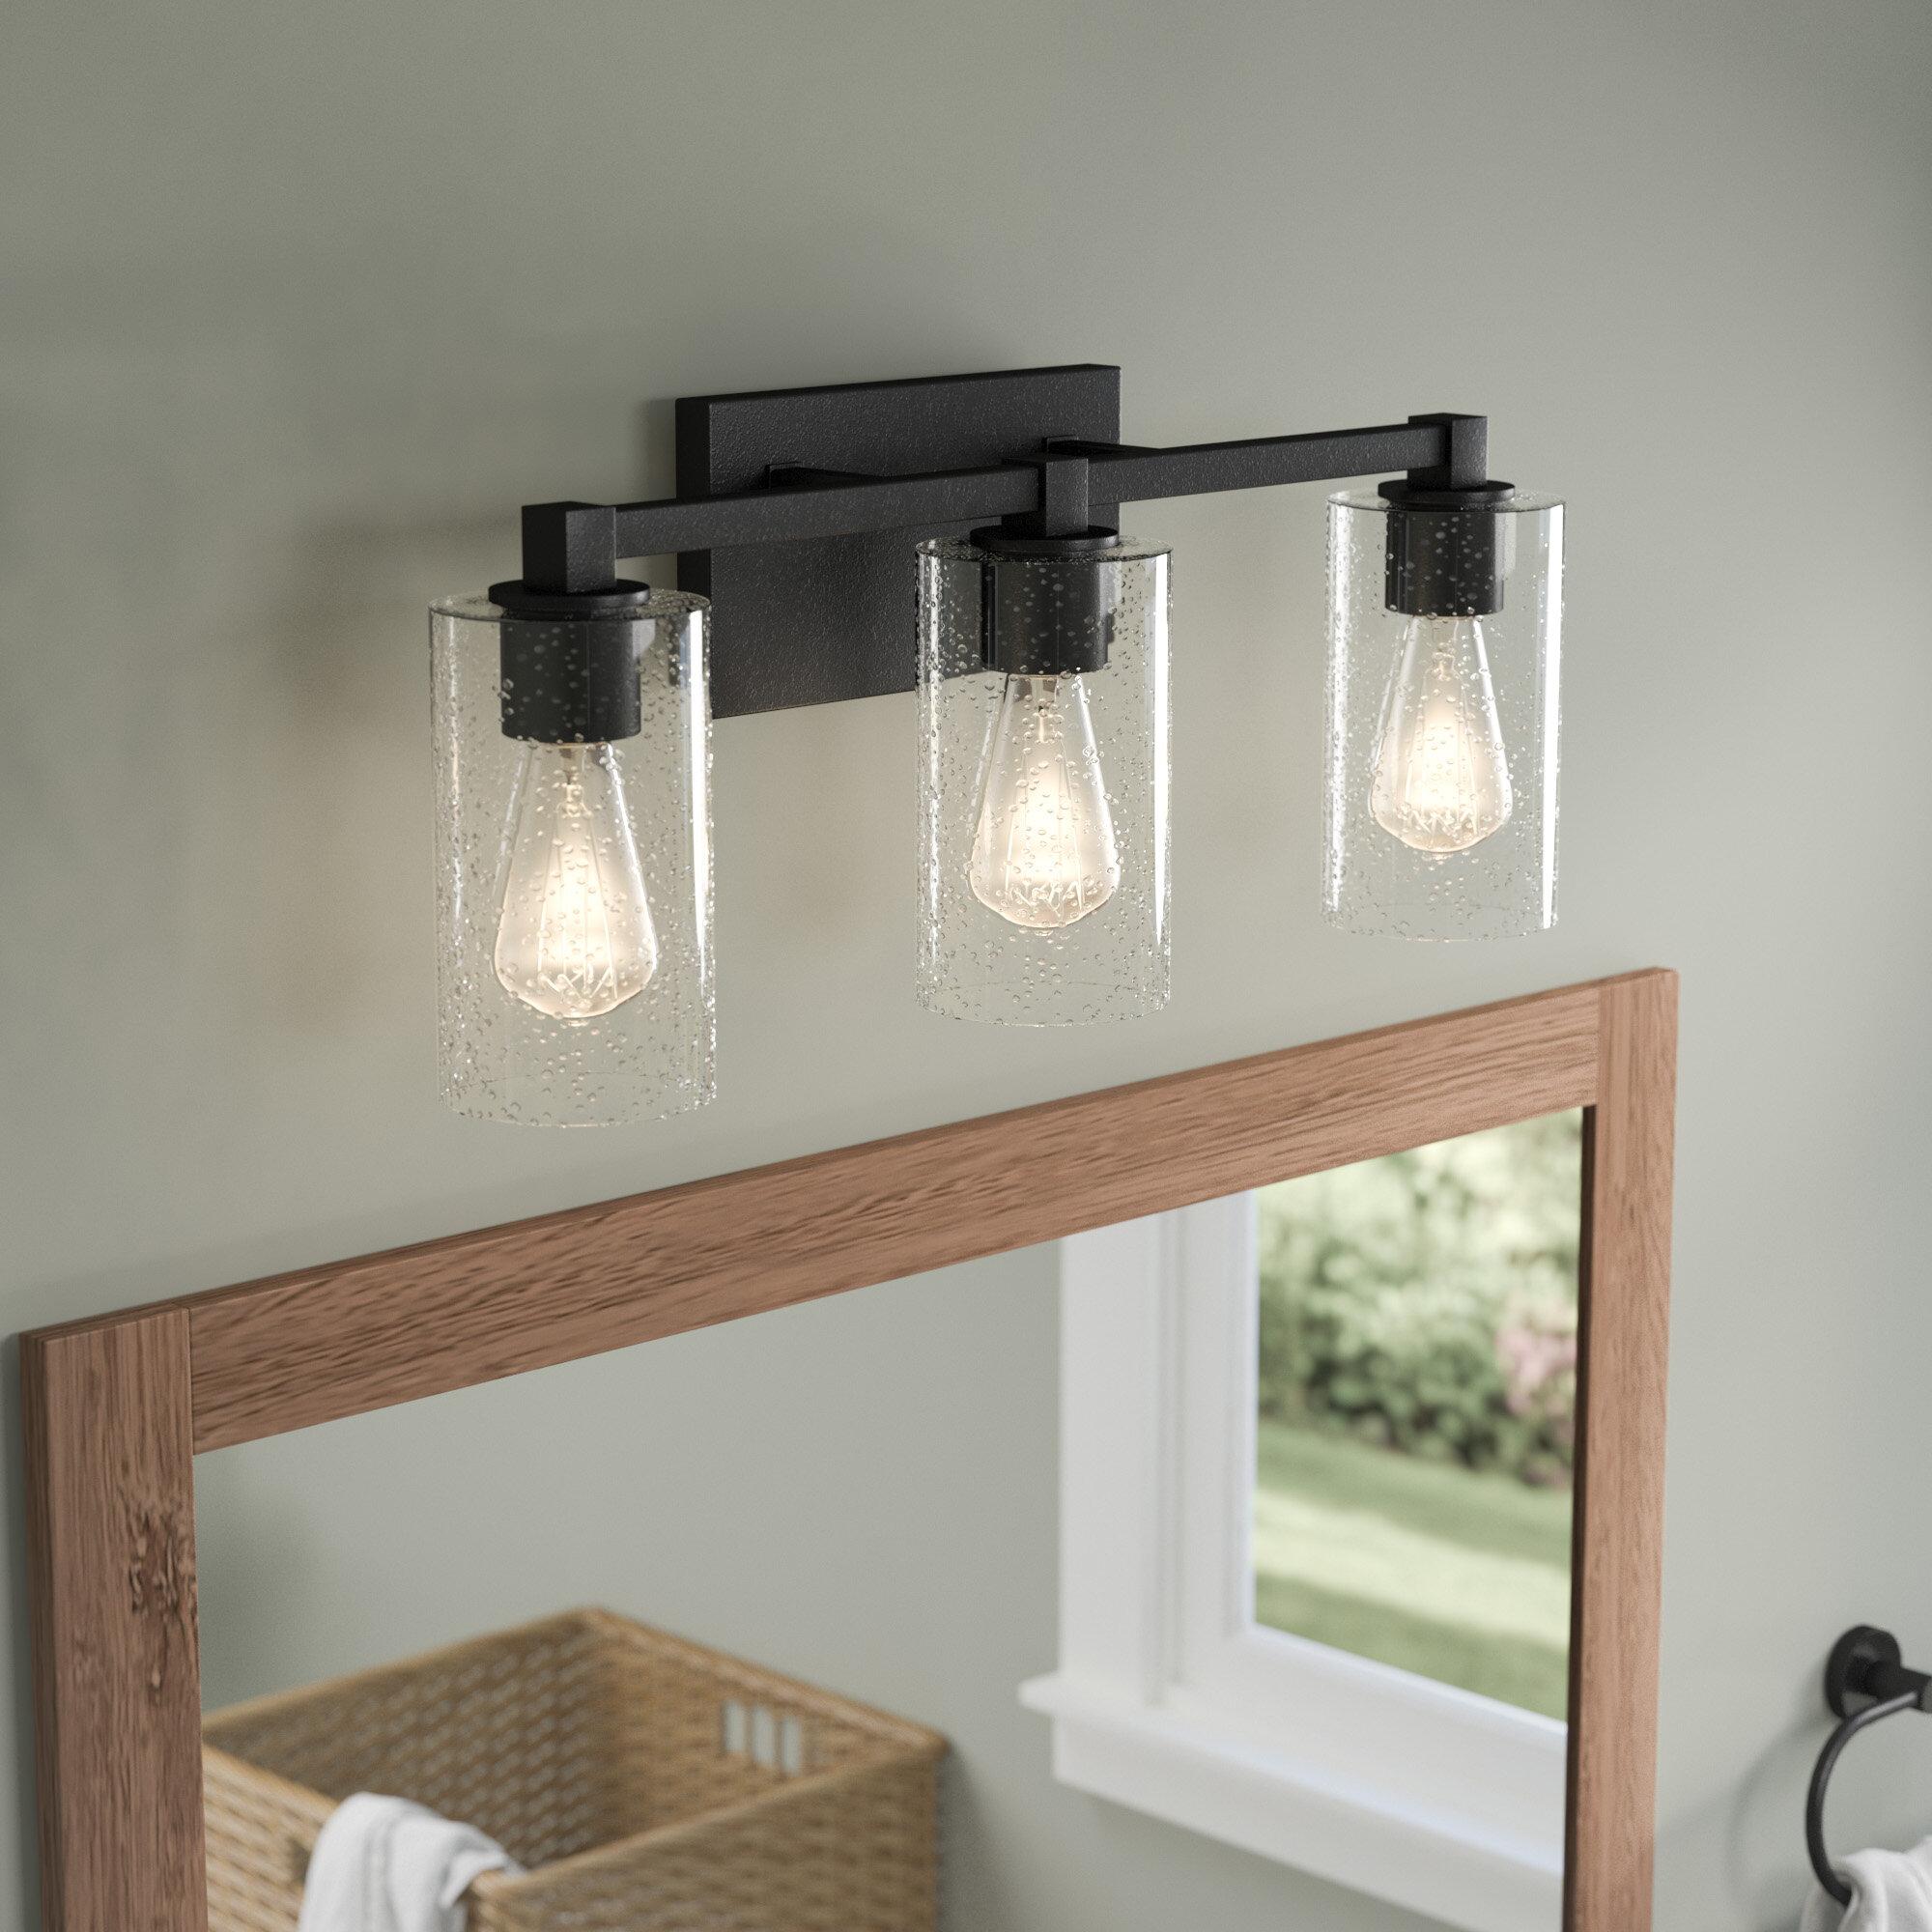 Mcdowell 3 light vanity light